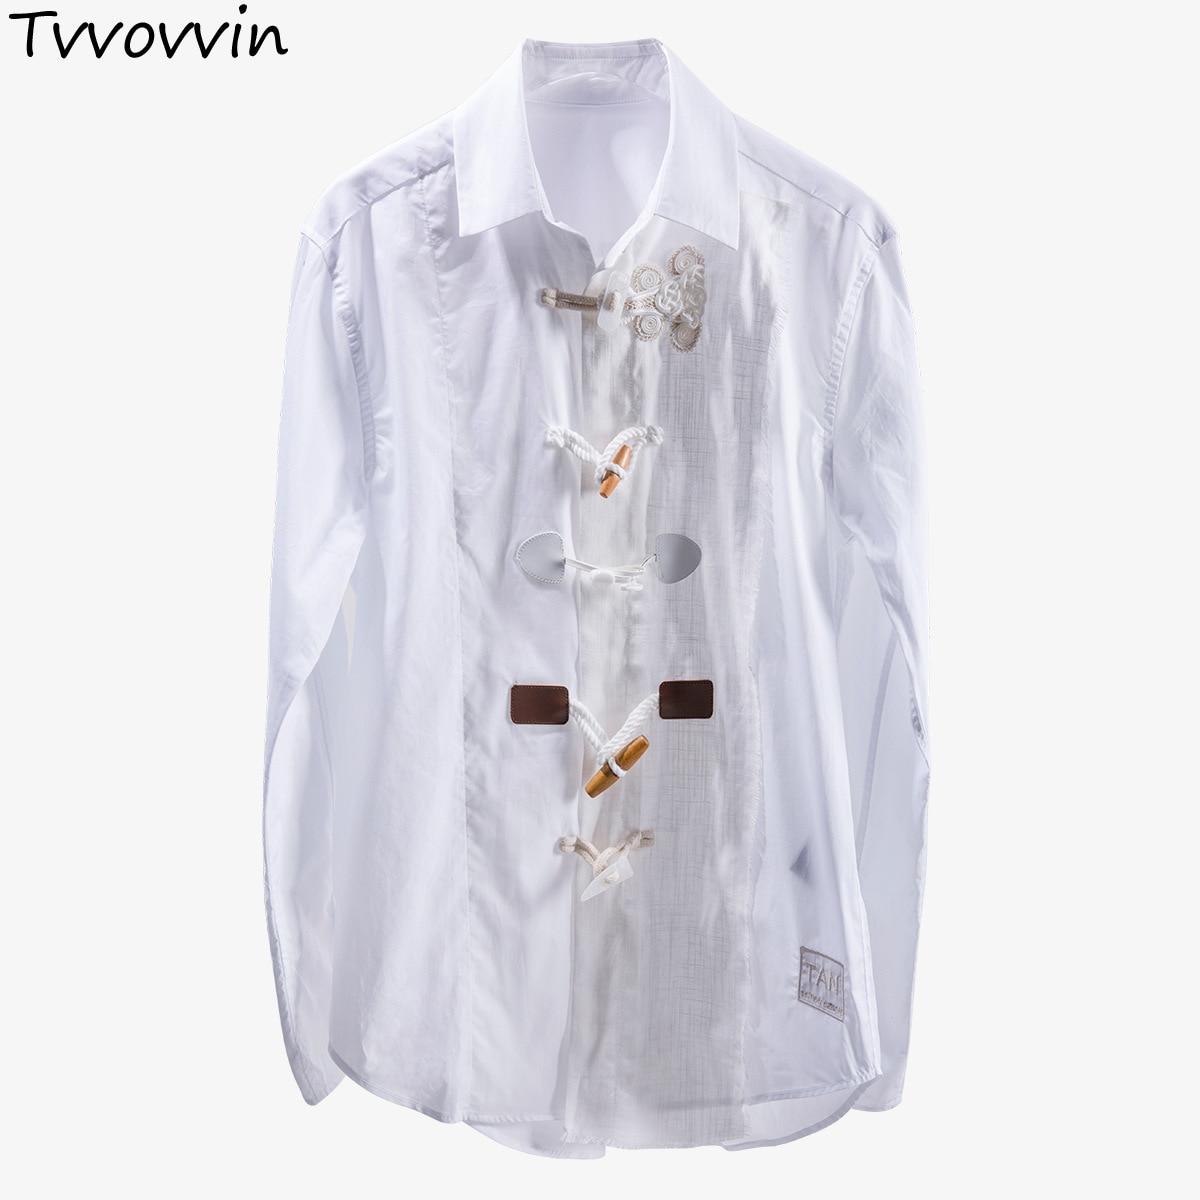 TVVOVVIN 夏 2019 新ラペル長袖ユニークなデザイン異なるボタンストリートシャツ女性ファッション潮 AS645  グループ上の レディース衣服 からの ブラウス & シャツ の中 1